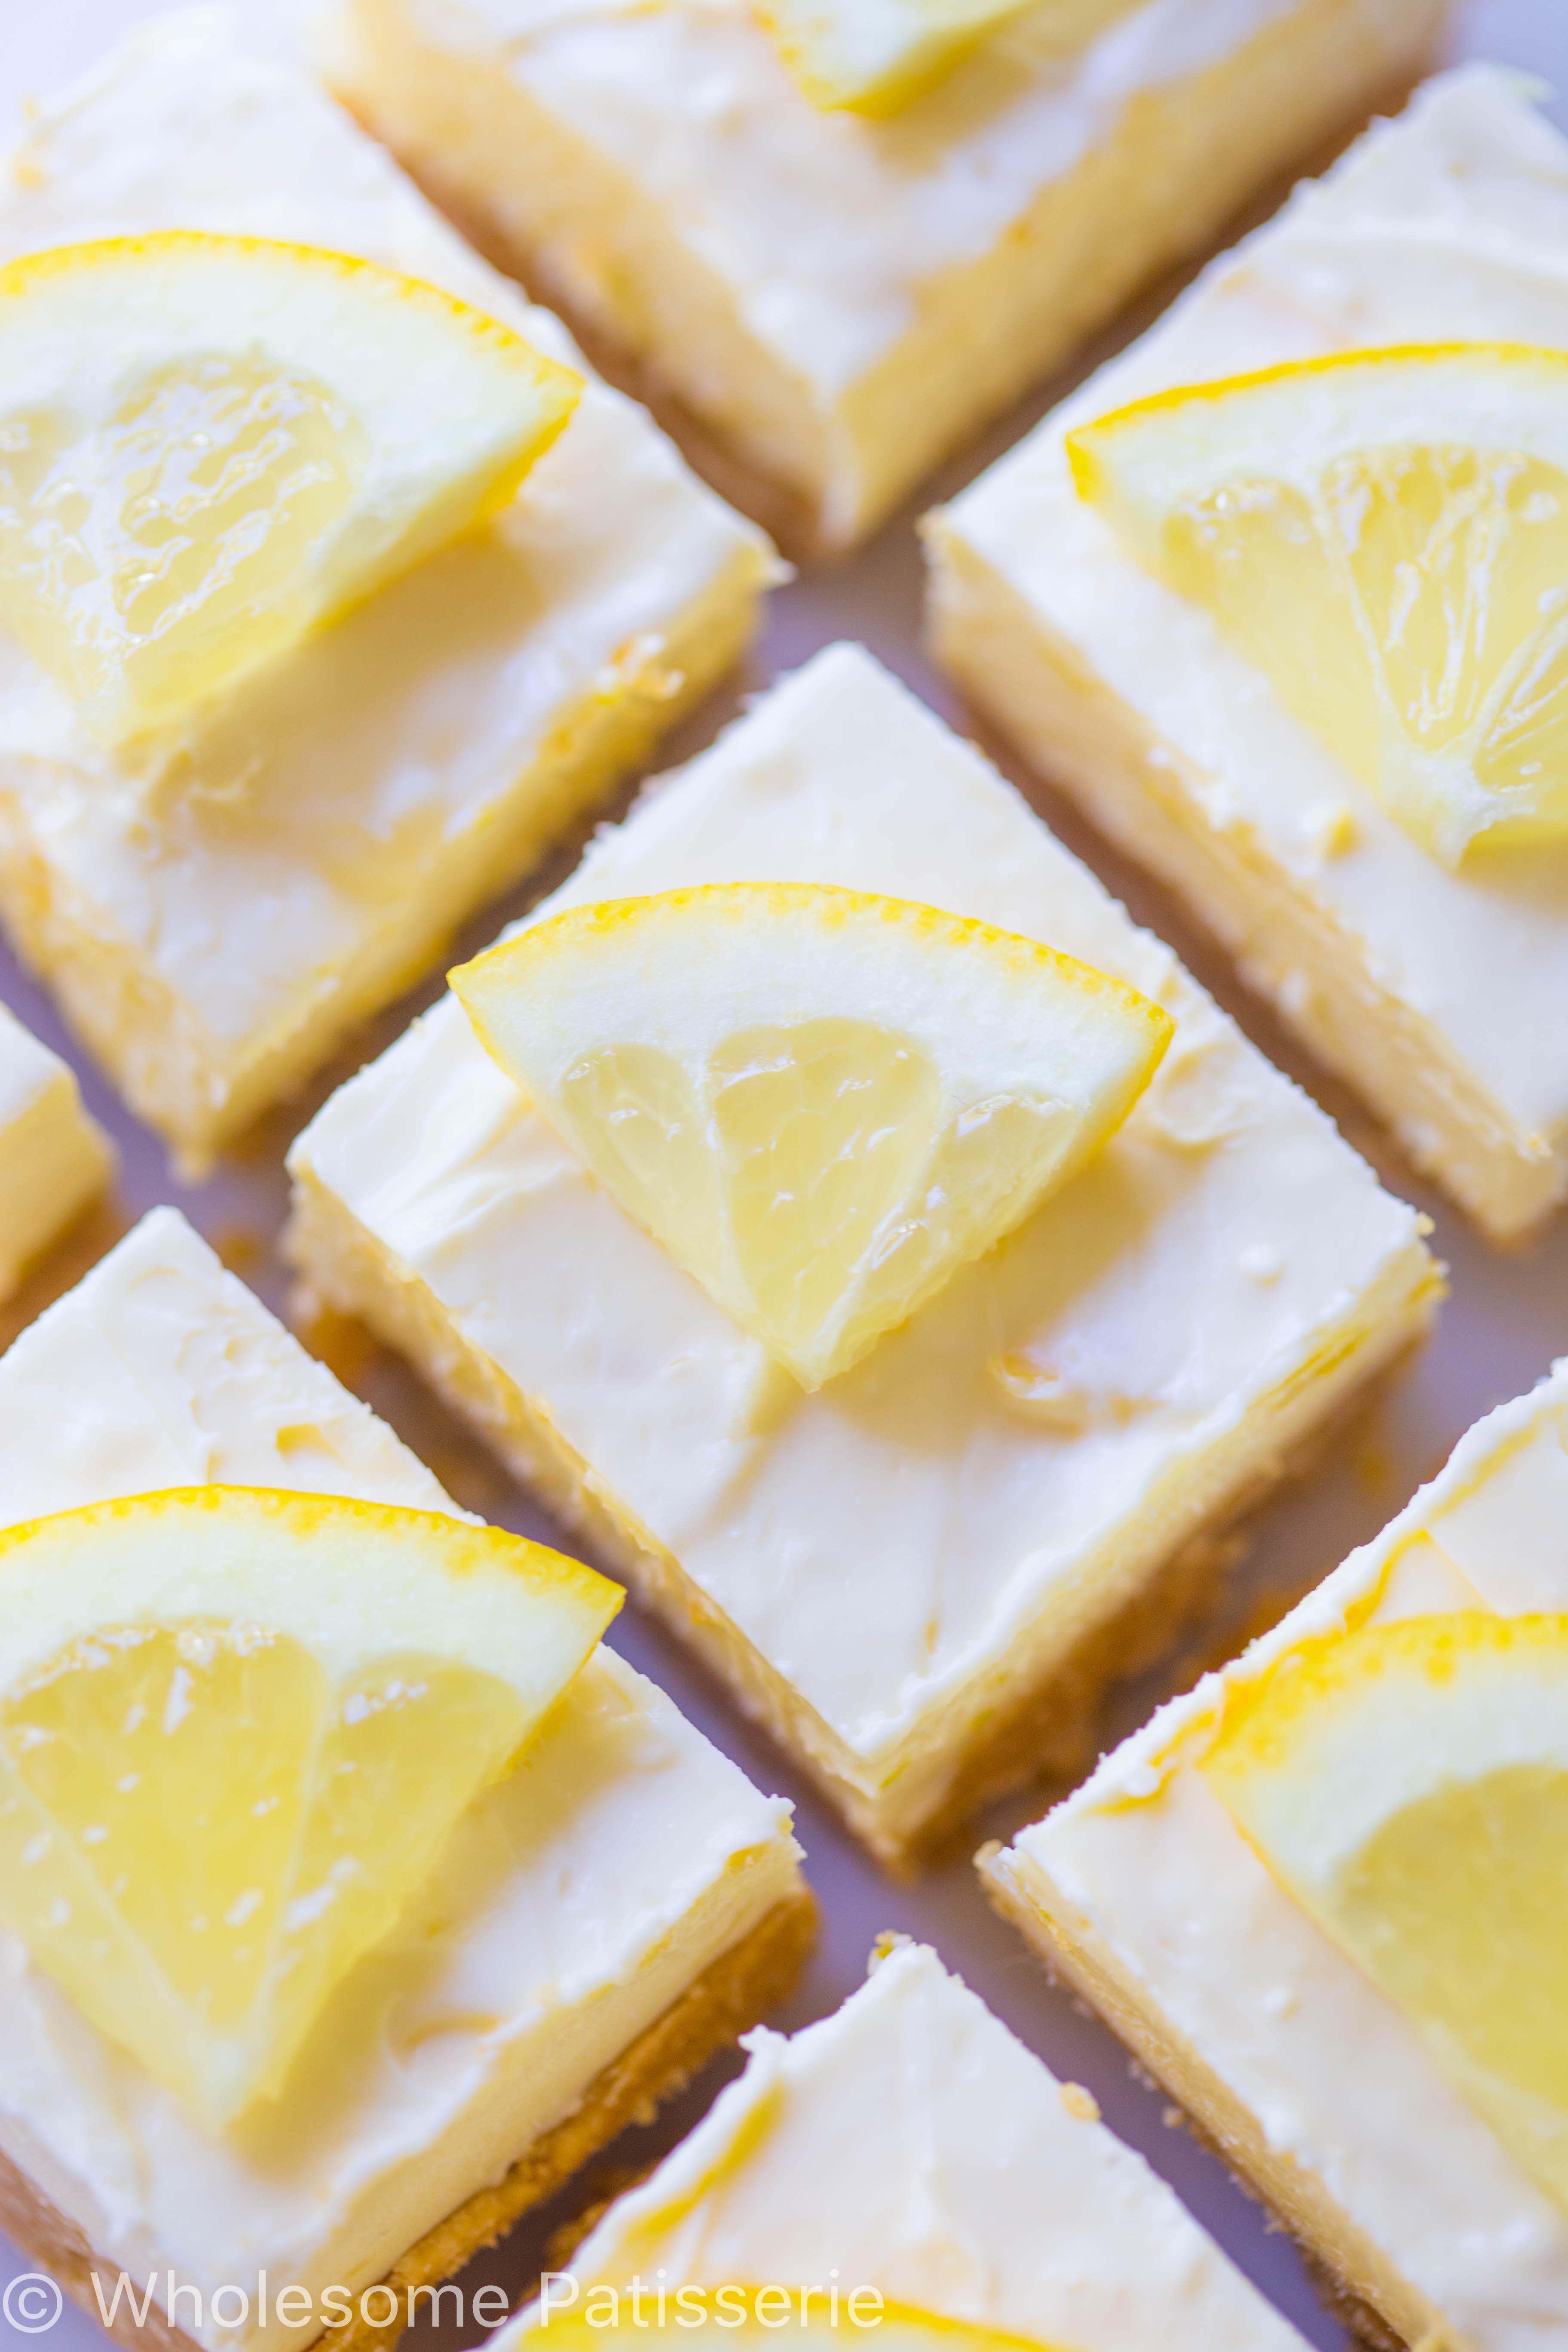 no-bake-lemon-cheesecake-slice-gluten-free-delicious-amazing-cake-cheesecake-bars